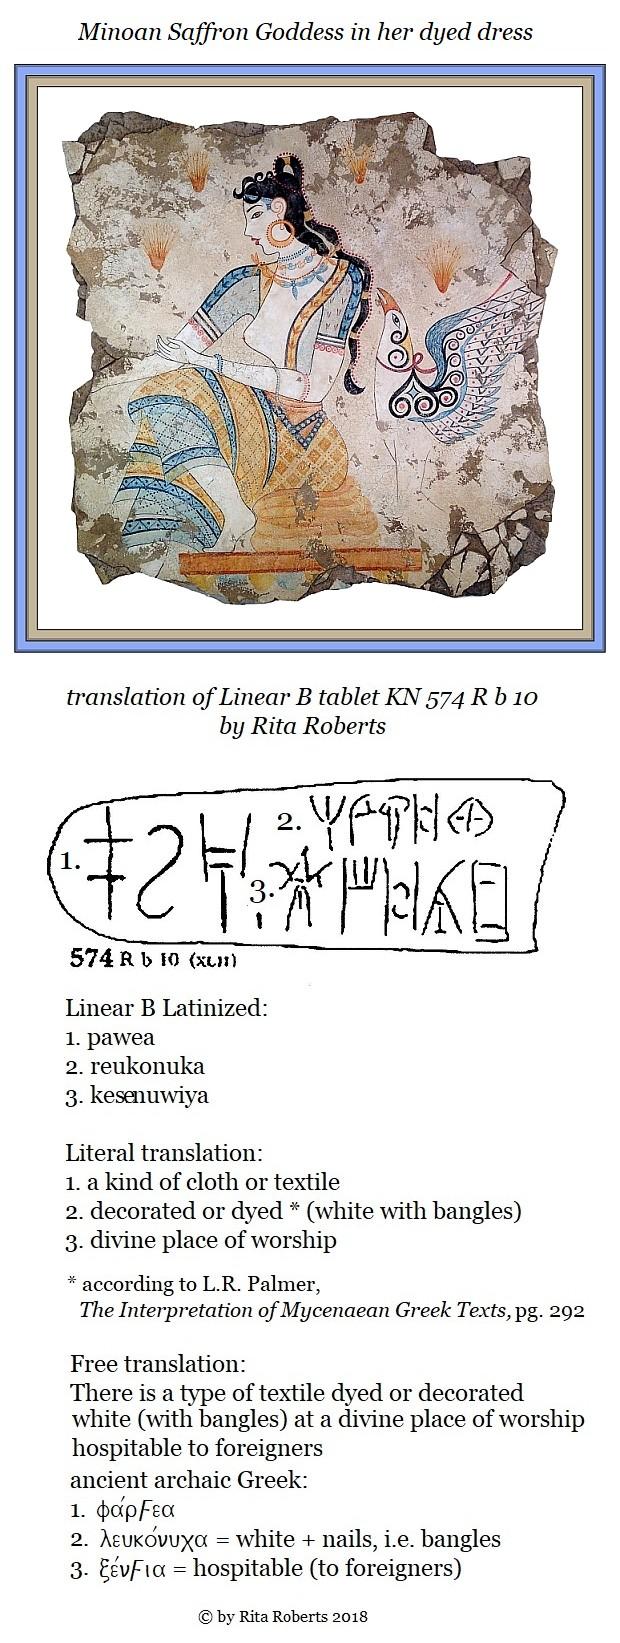 Linear B tablet KN 574 R b 10